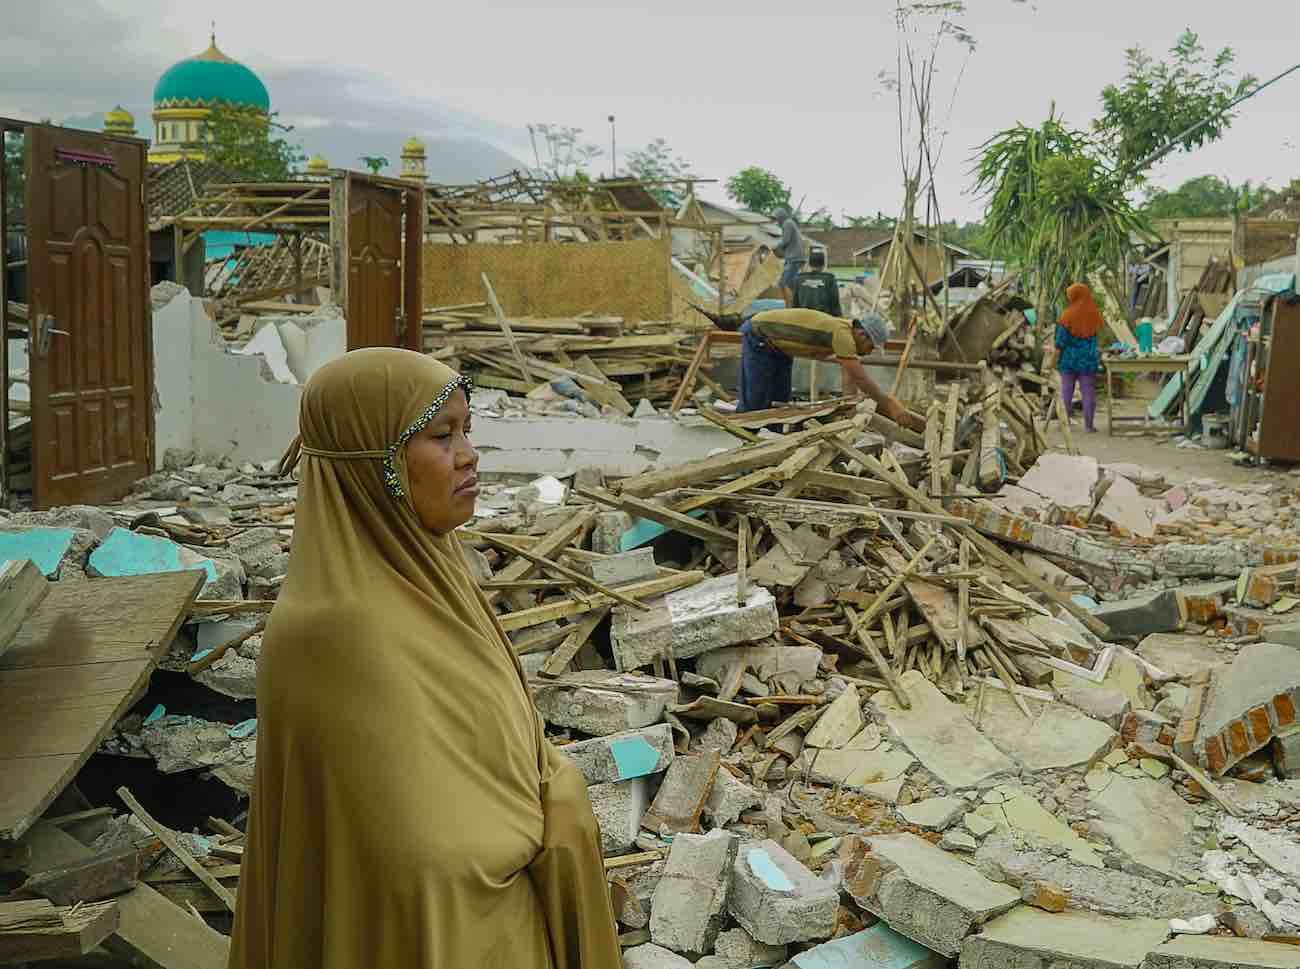 Ketika Masyarakat Bertanya Tentang Gempa